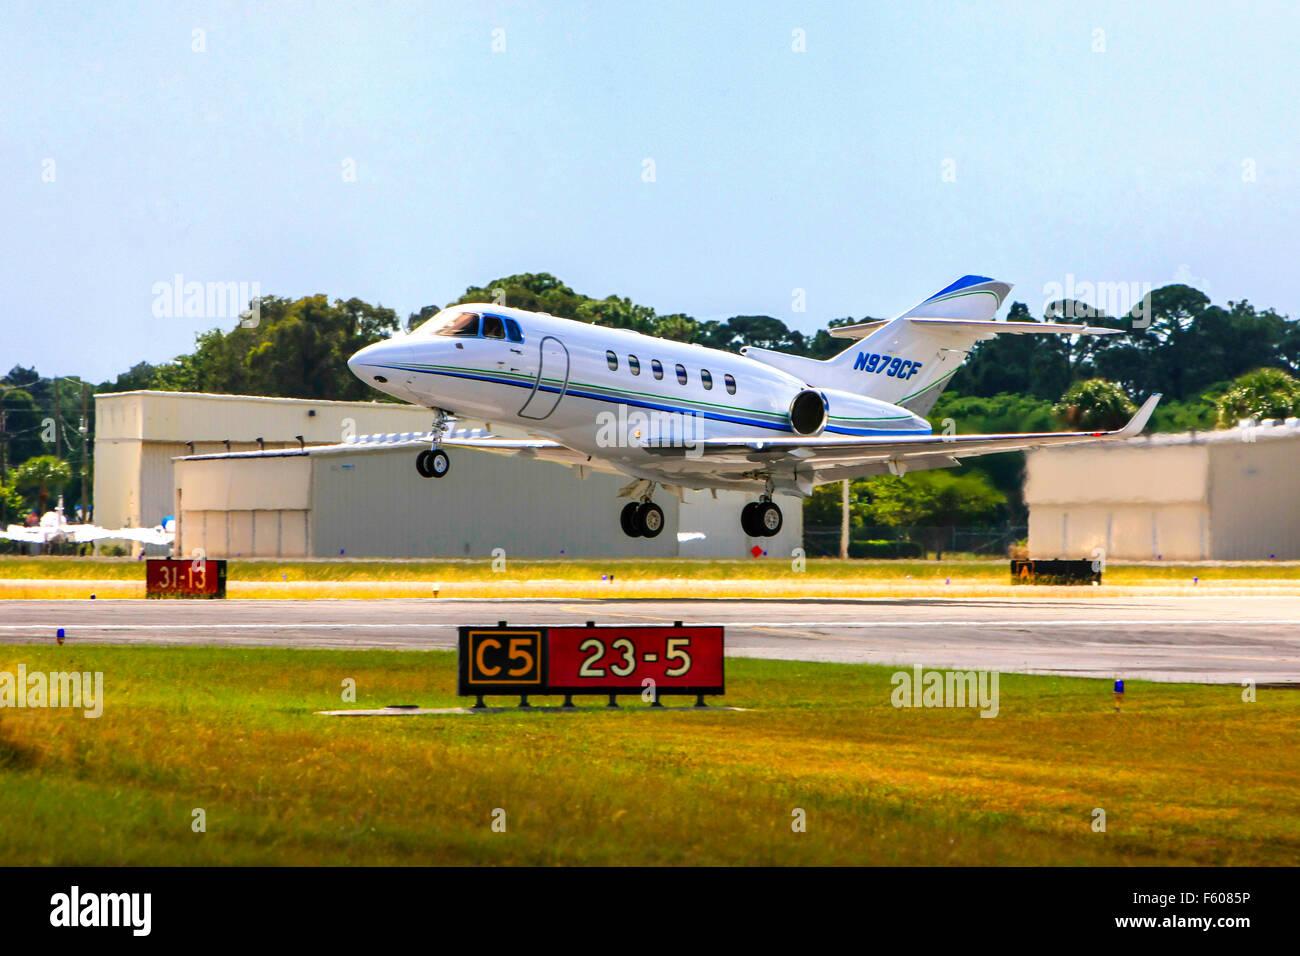 A Hawker Beechcraft 900XP Executive company jet - Stock Image